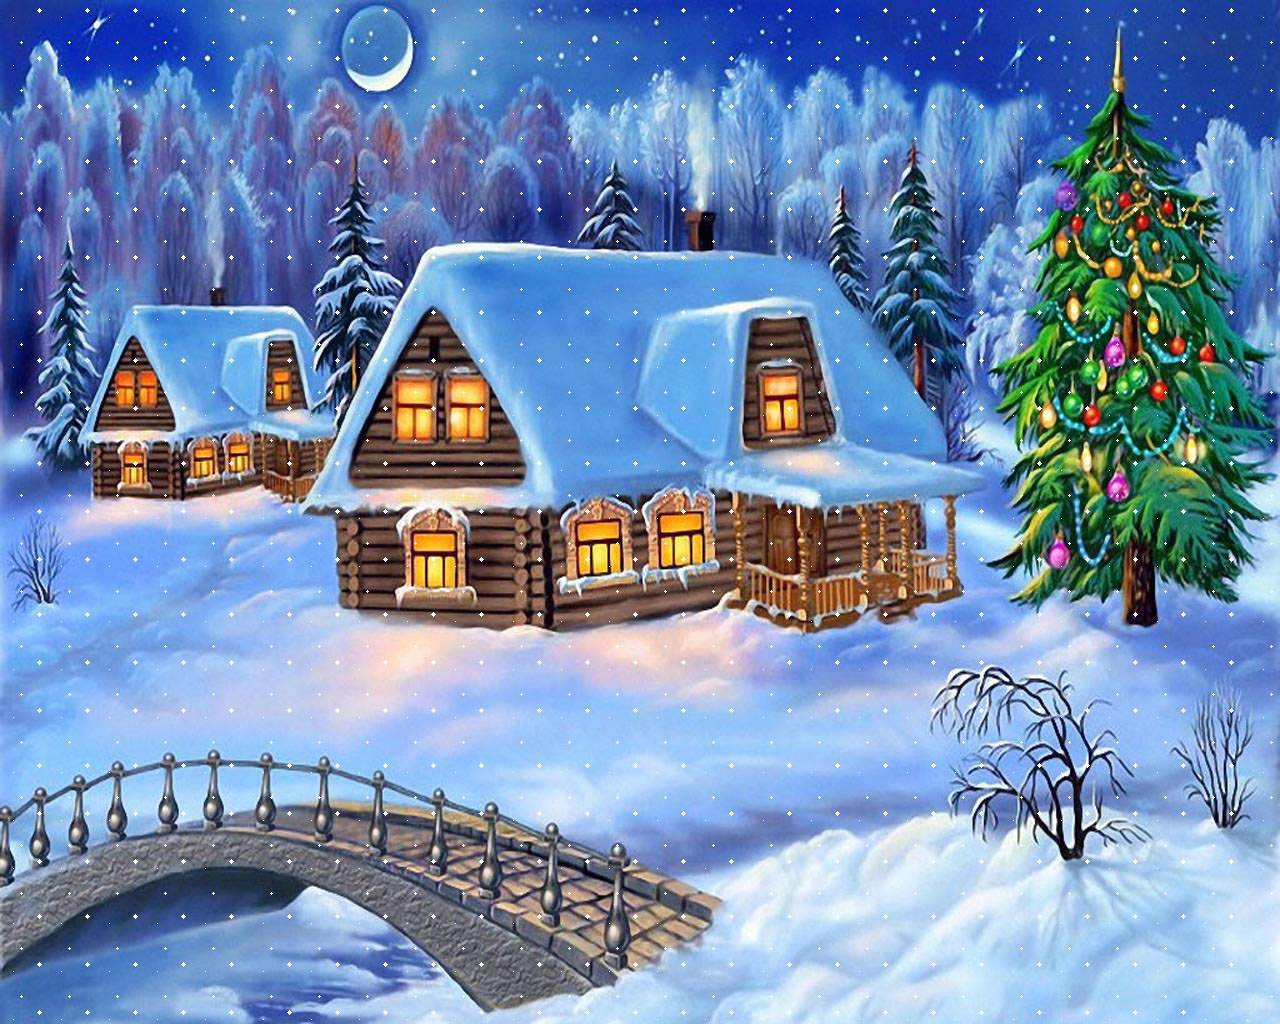 wallpaper christmas themeschristmas wallpaper themes windows 7free 1280x1024